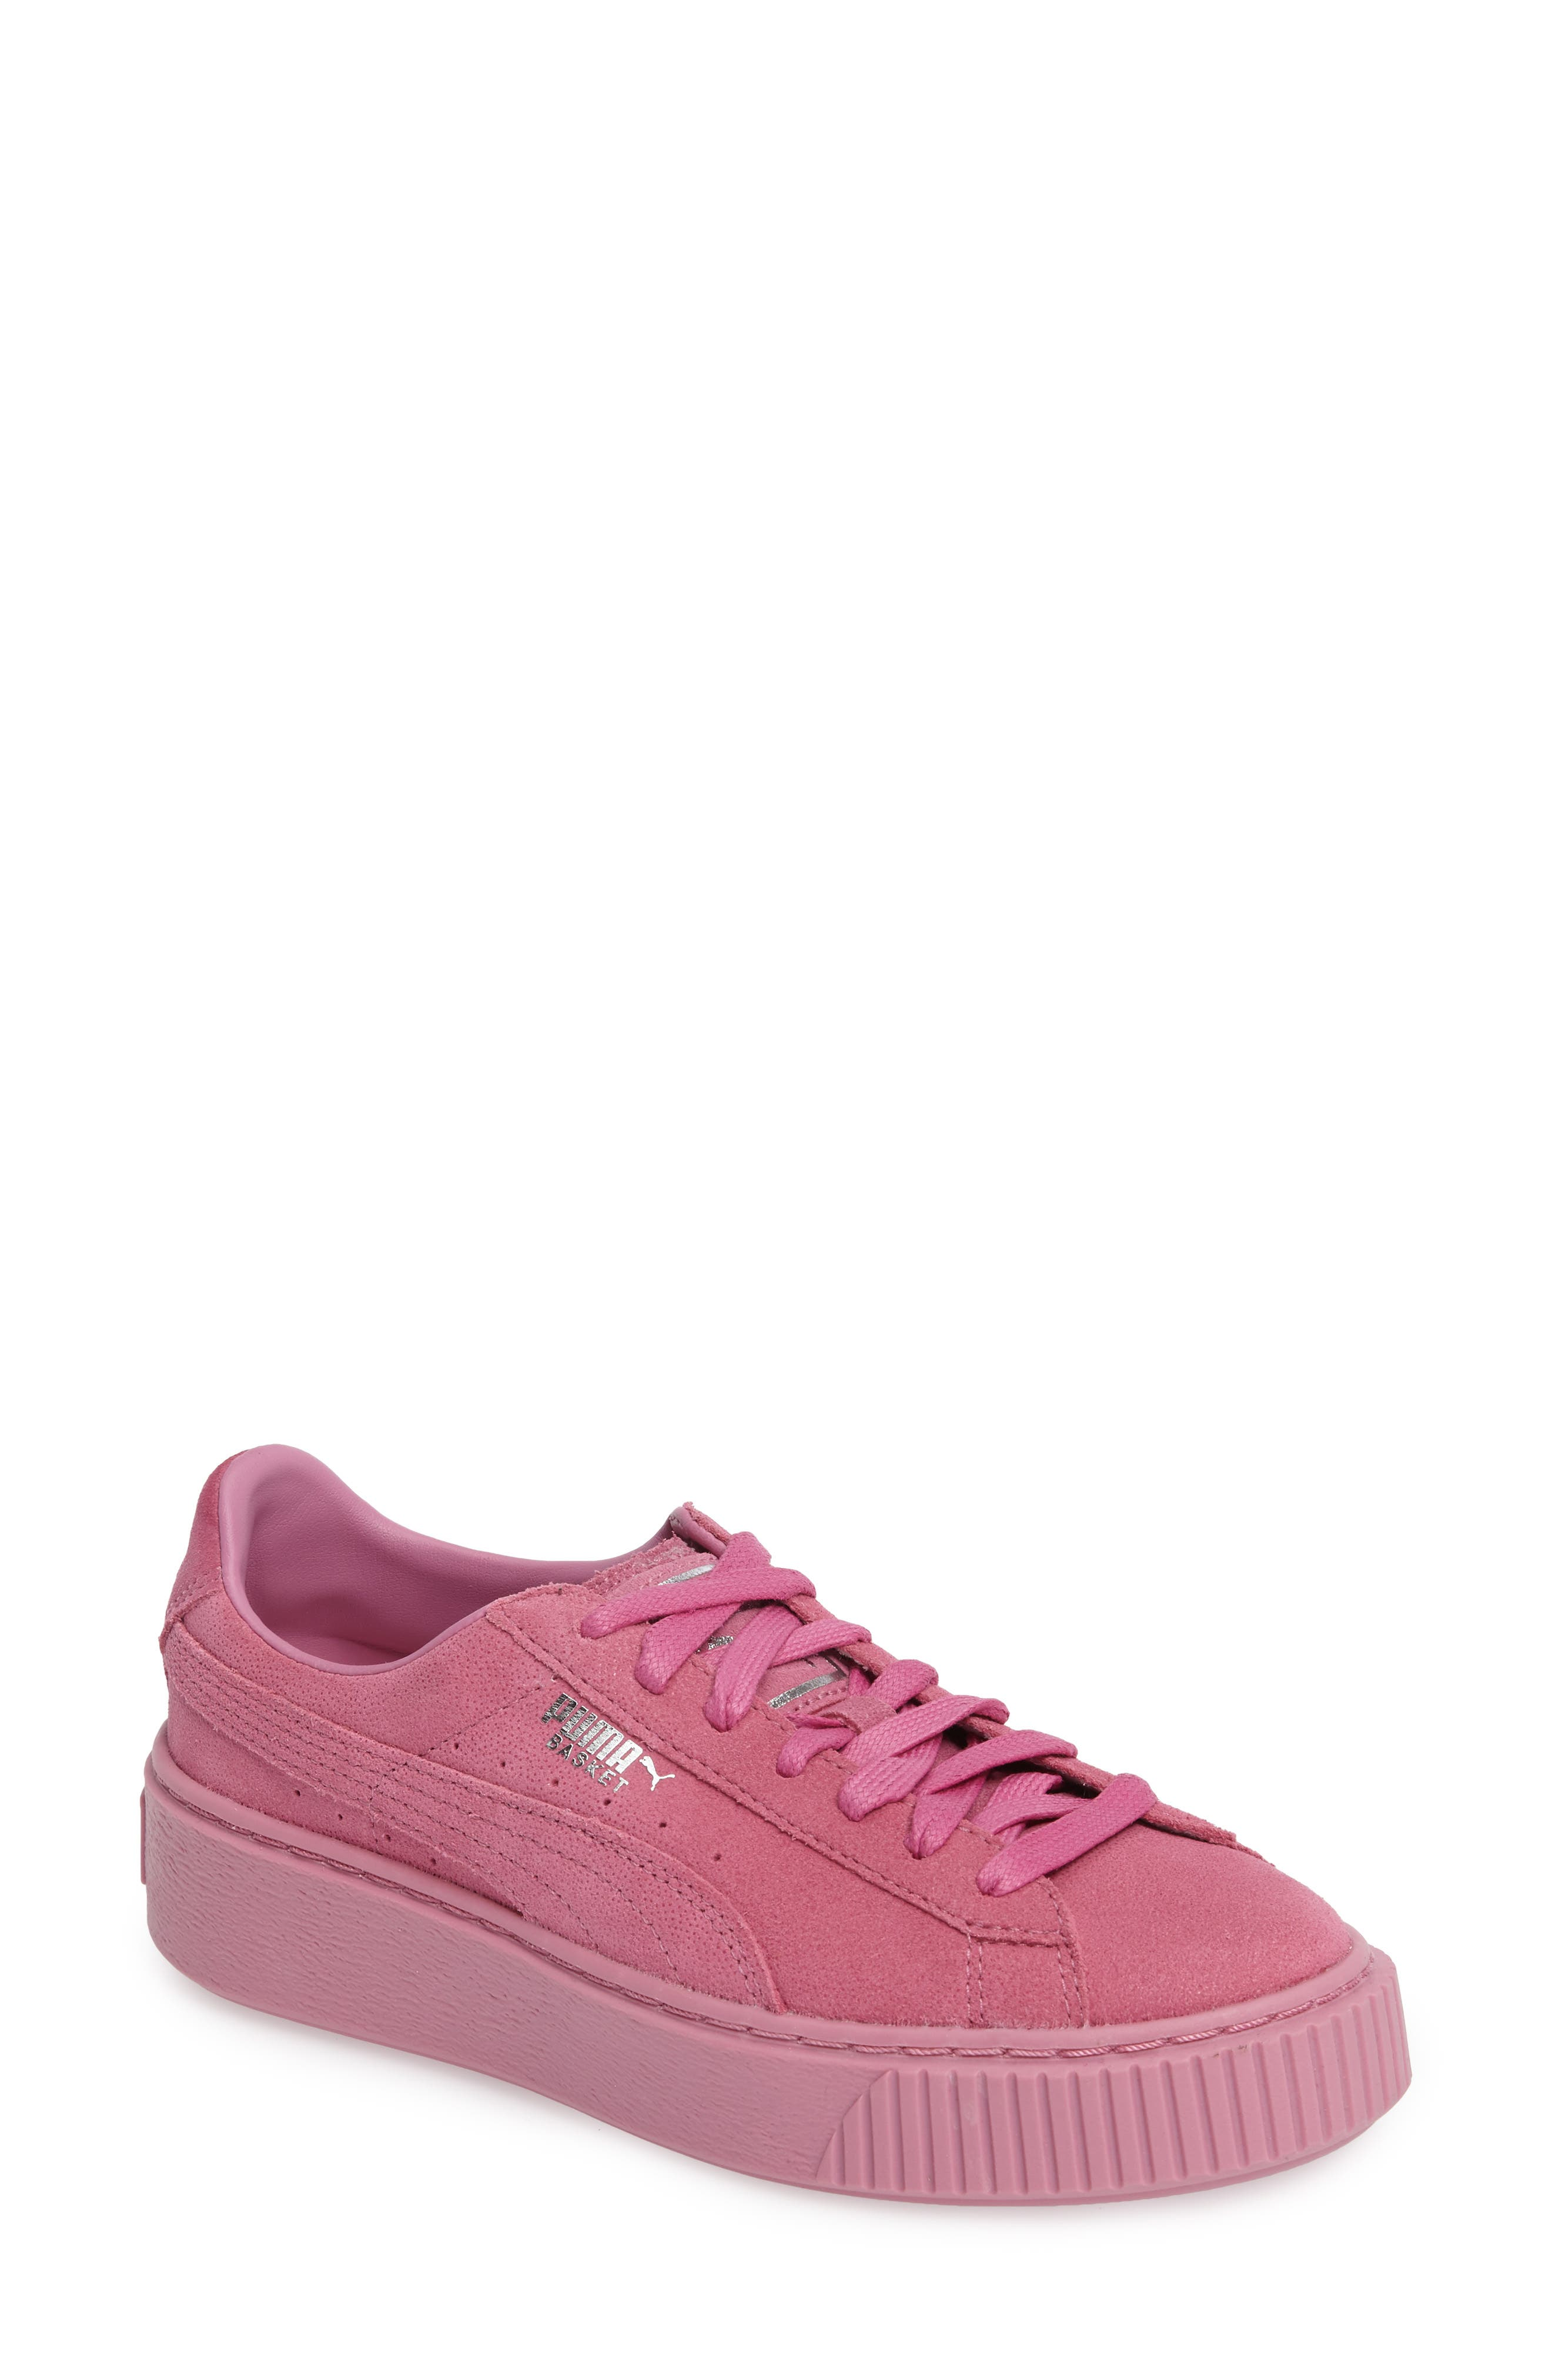 Alternate Image 1 Selected - PUMA Reset Platform Sneaker (Women)